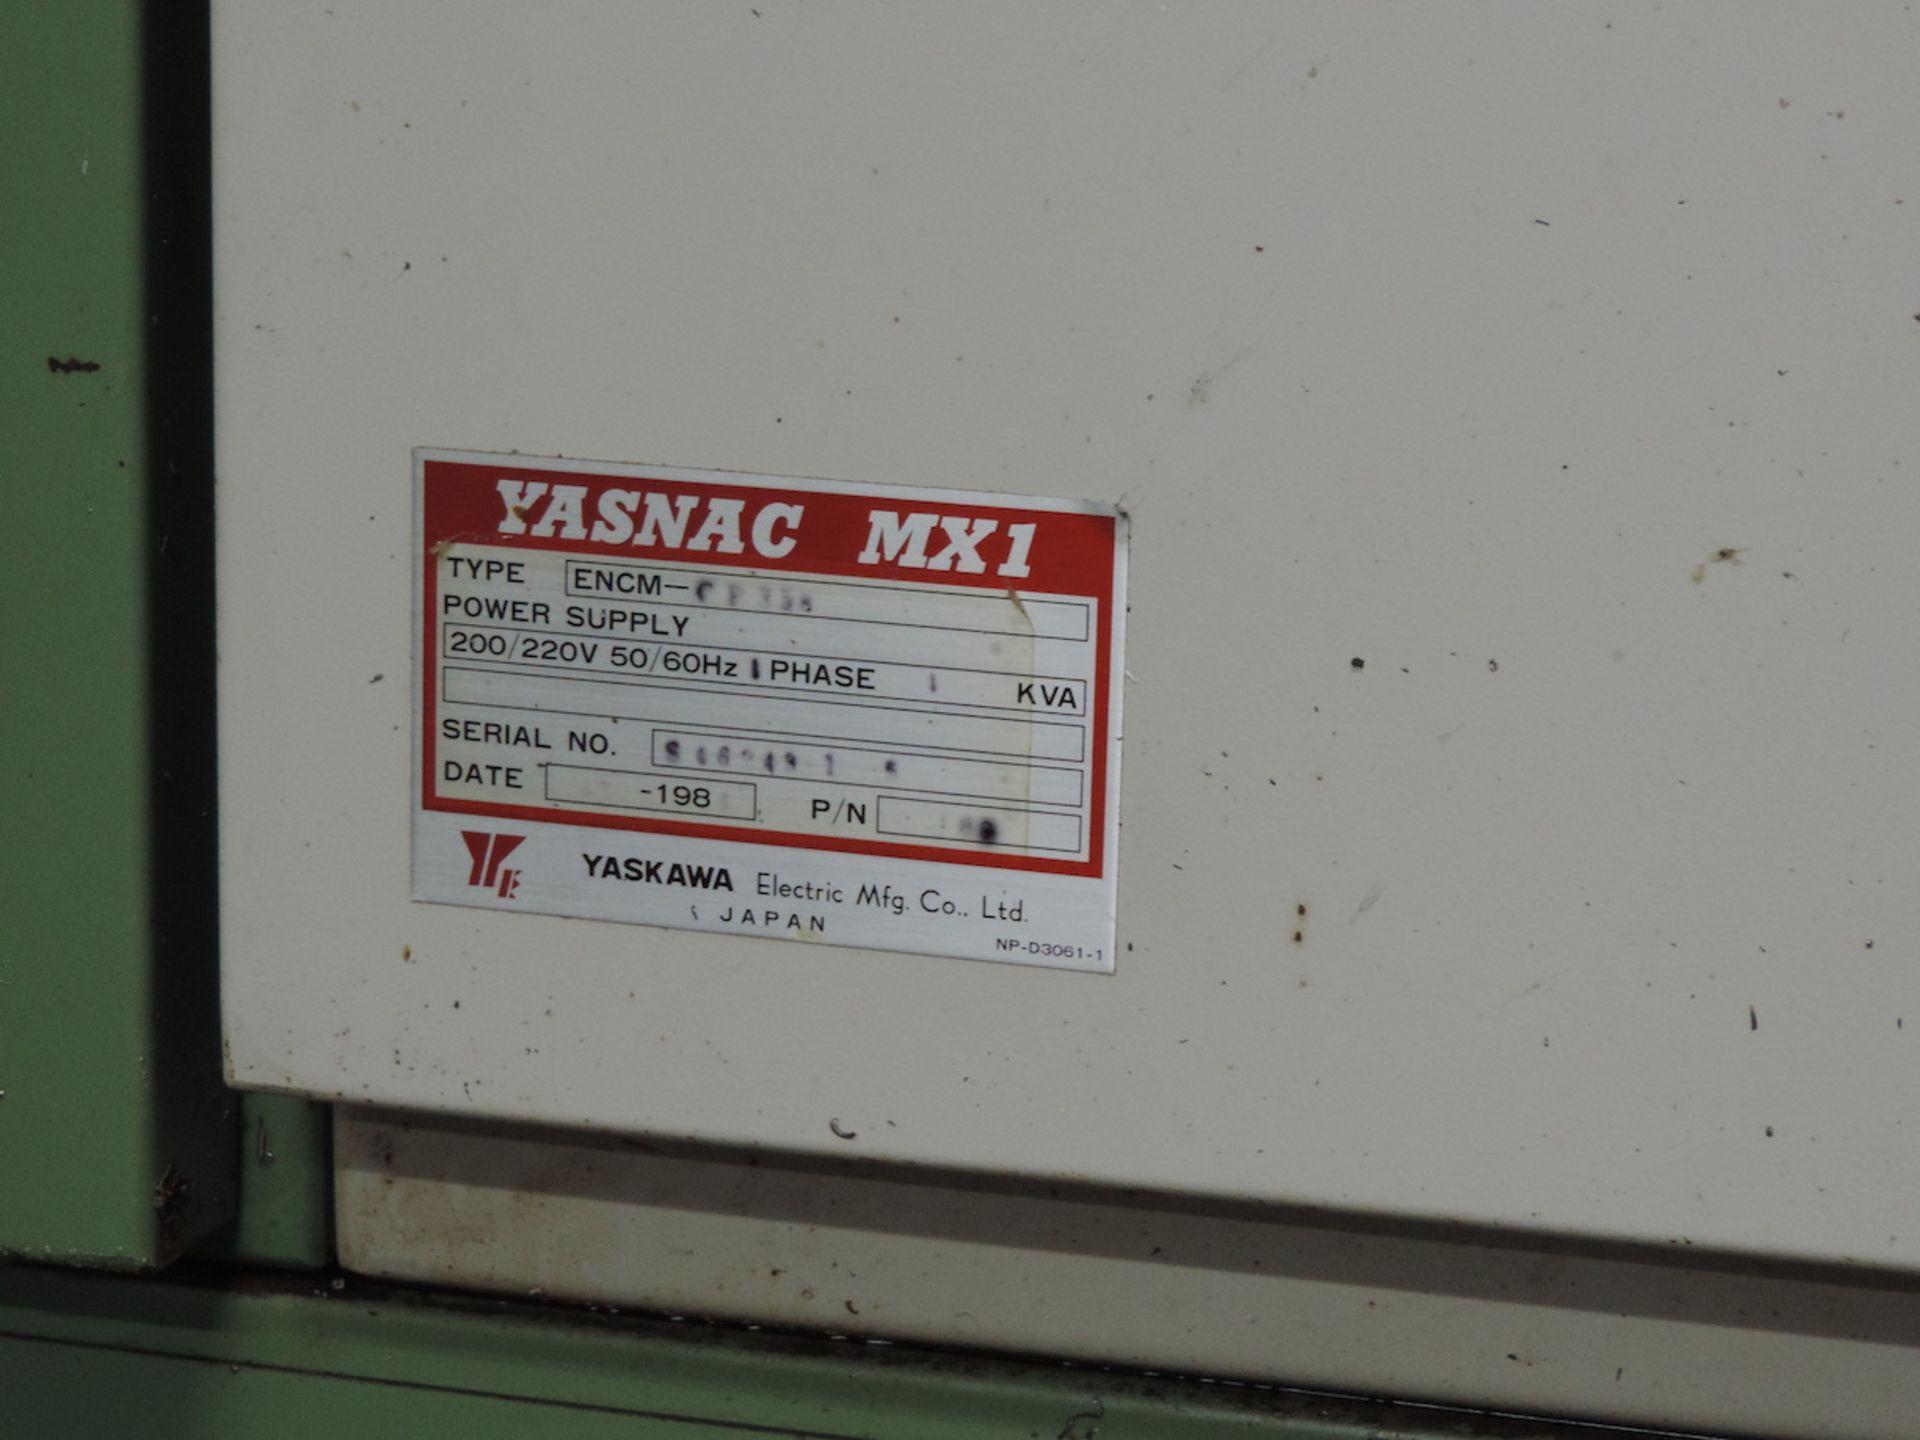 "MORI SEIKI MV-80 VMC, YASNAC MX-1 CONTROL, XYZ TRAVELS: 60"" X 31"" X 29"", 74"" X 32"" TABLE, 50 SPINDLE - Image 11 of 13"